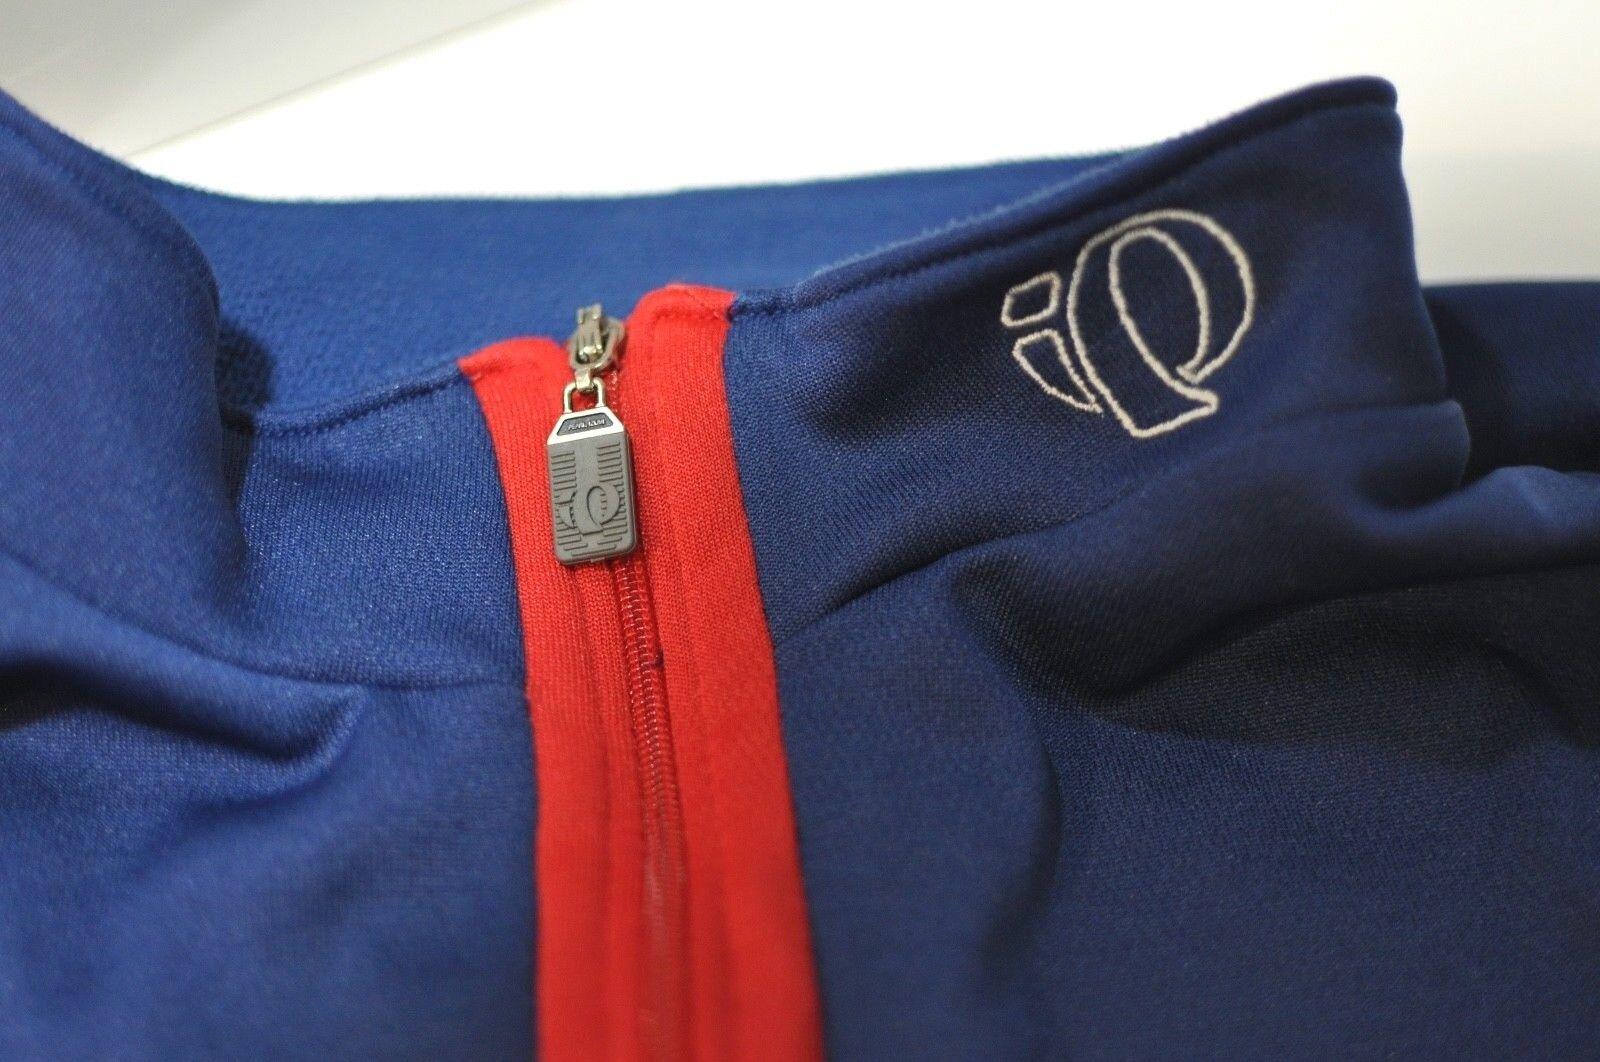 Pearl Izumi 1 4 zip  cycling long sleeve shirt jersey XL  leisure